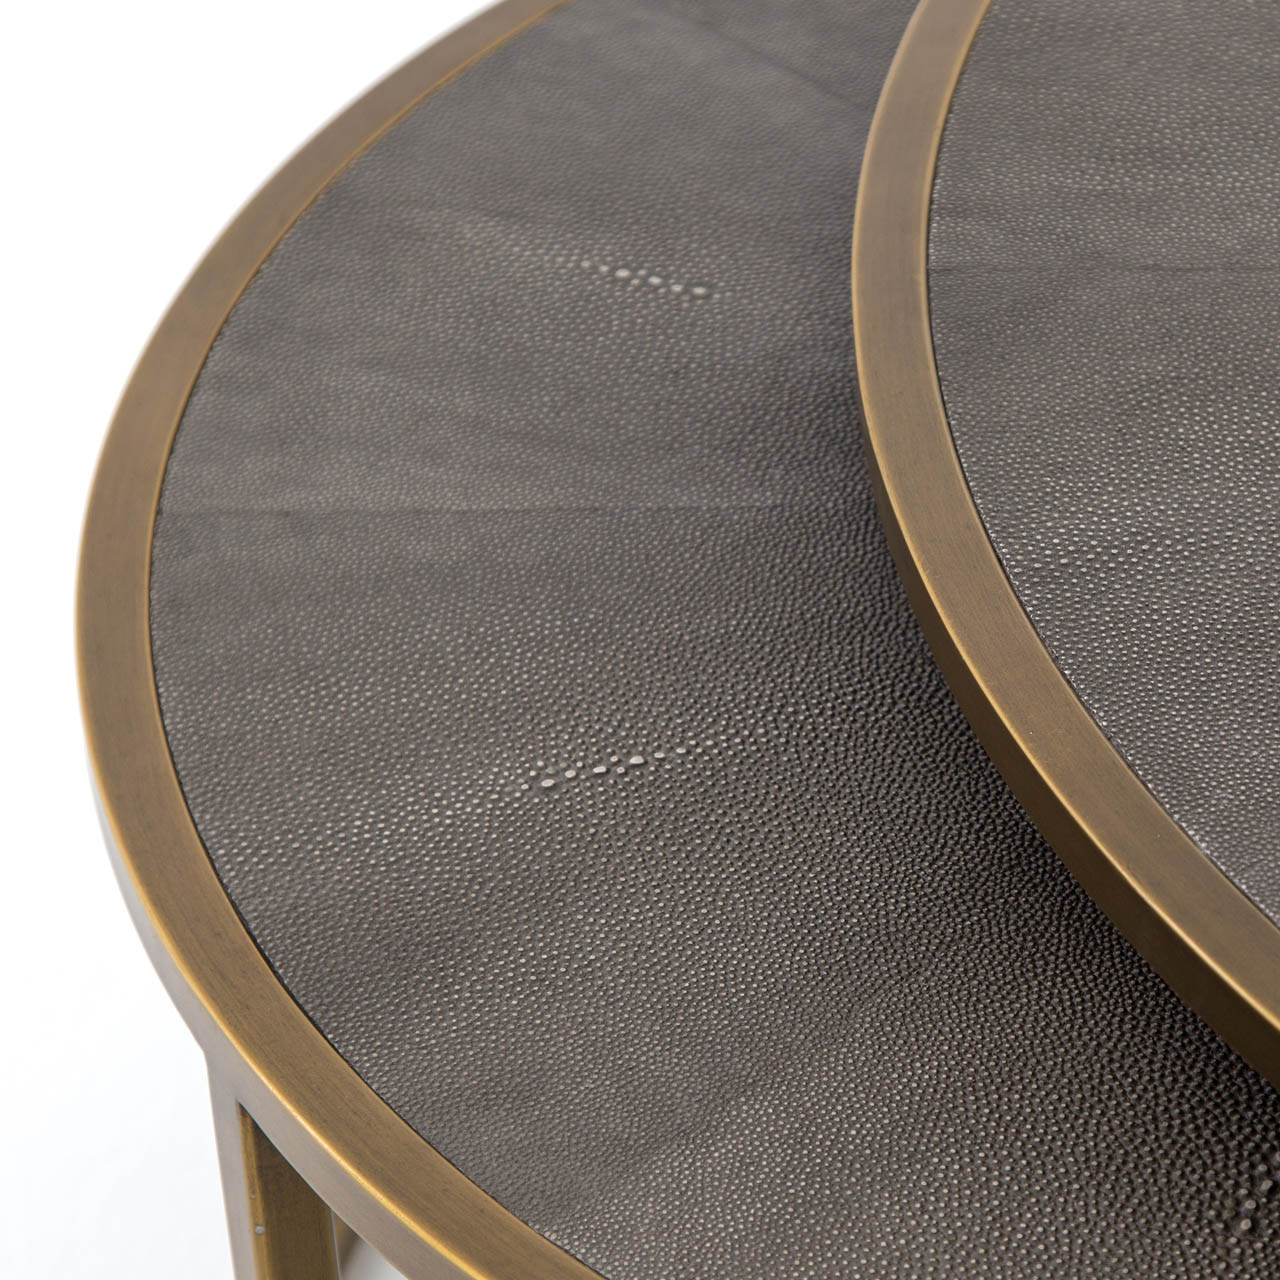 Soleil Nesting Coffee Table - Gunmetal